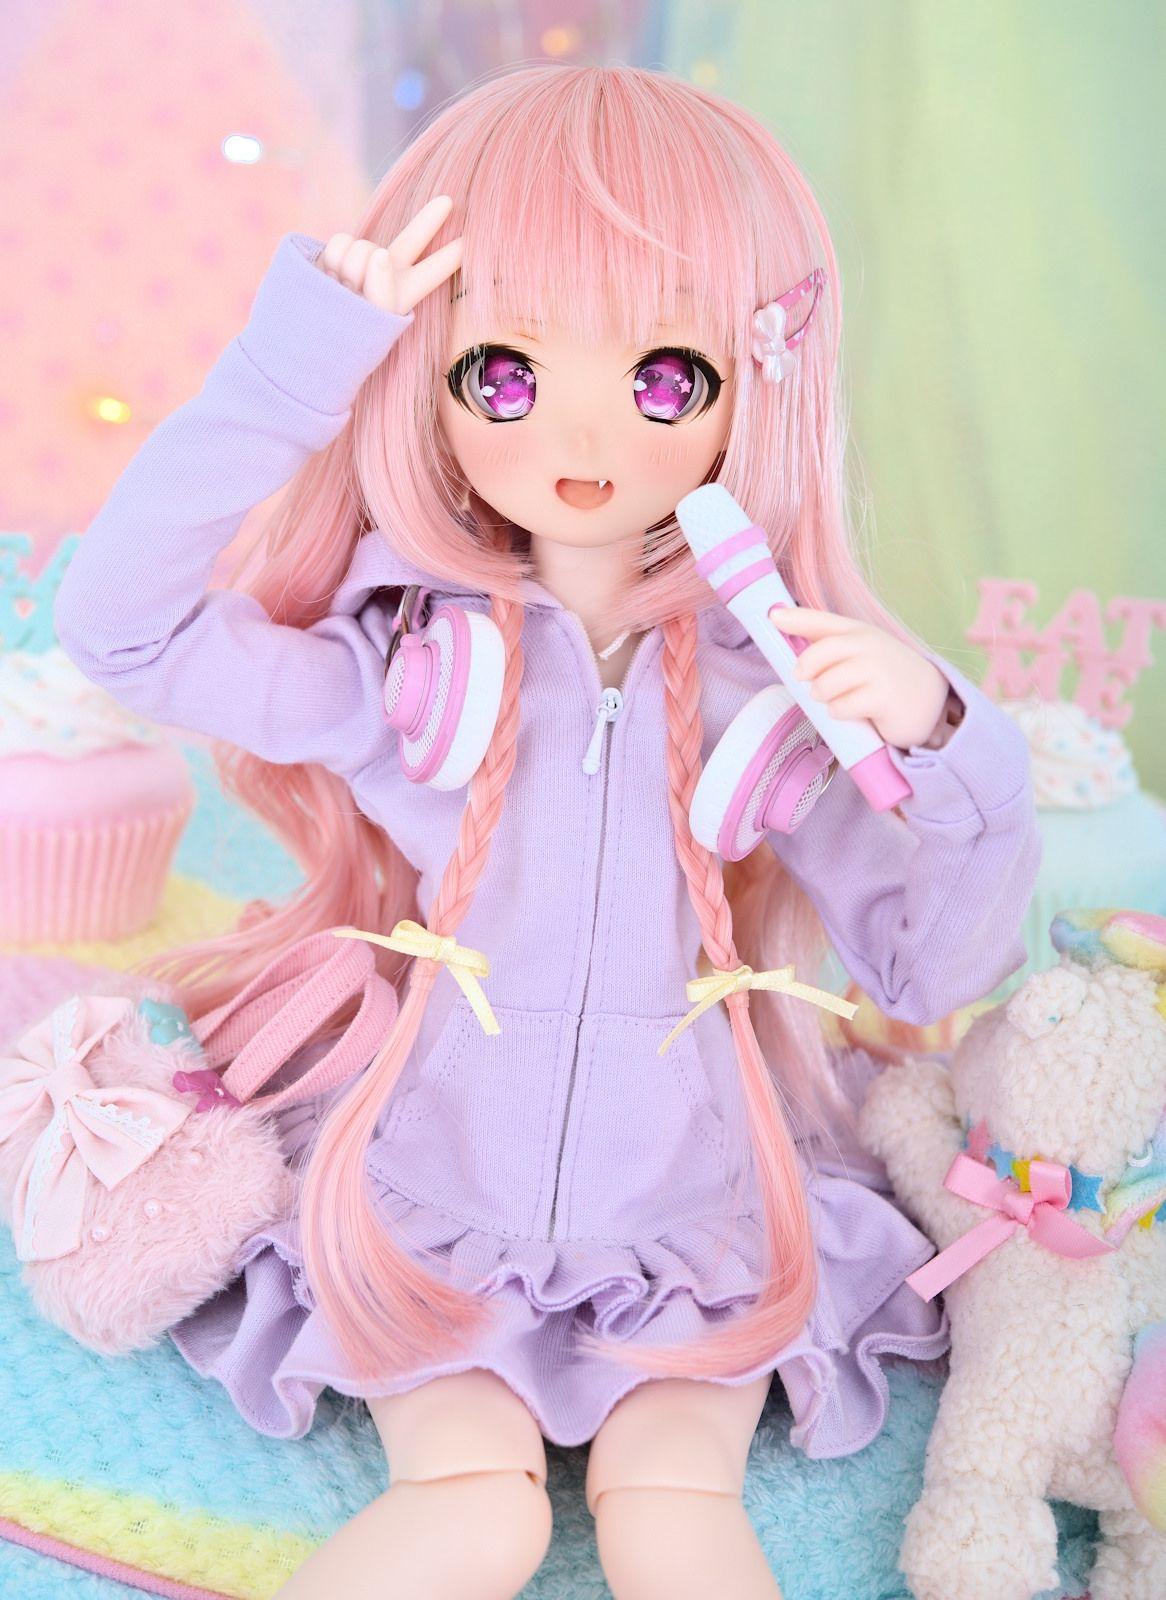 Lala 009 in 2018 elegant dolls pinterest dolls anime dolls and kawaii doll